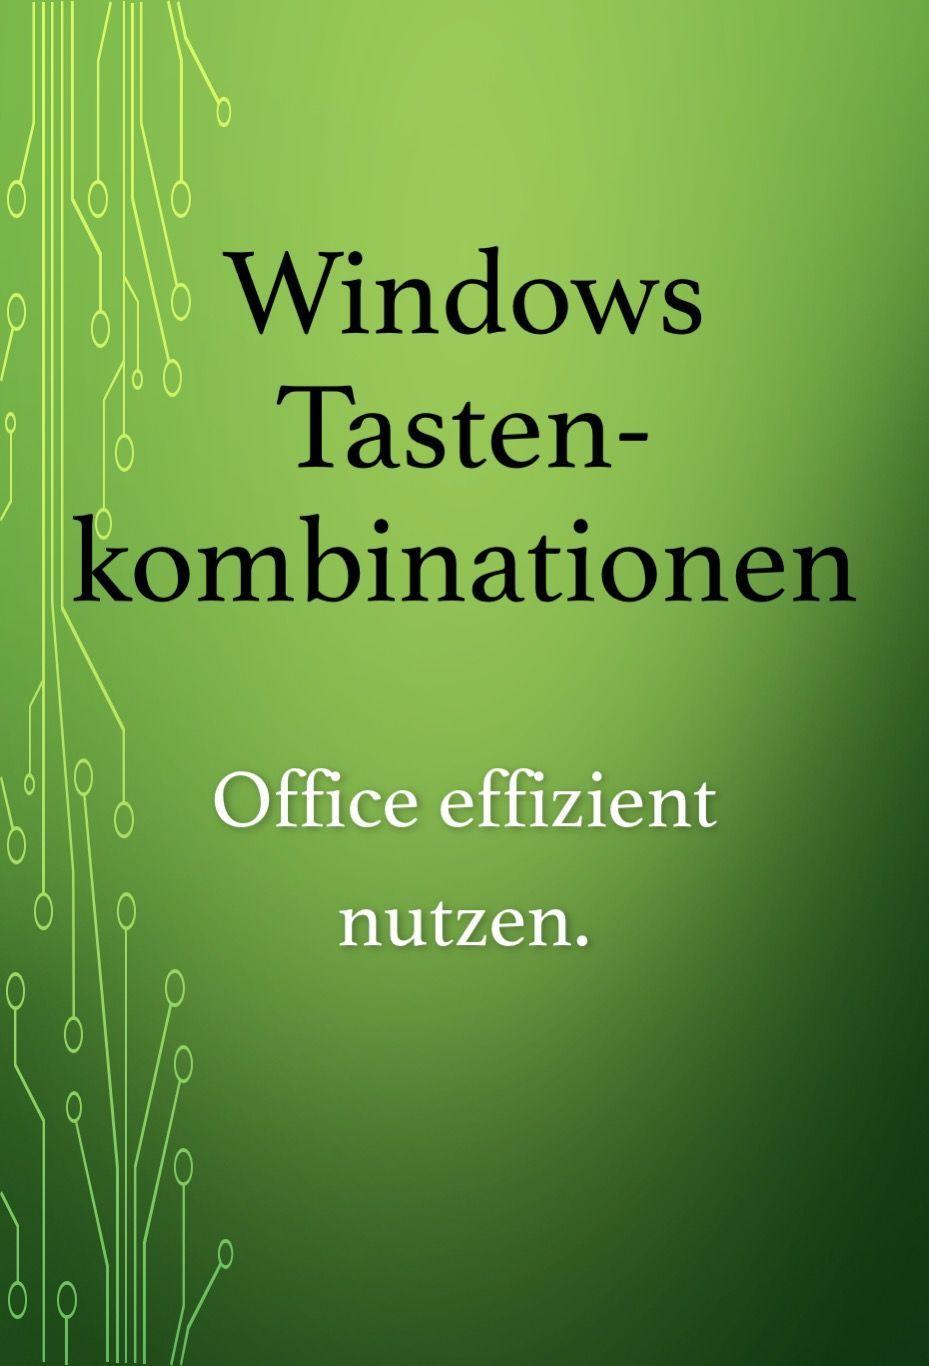 Windows Tastenkombinationen Hilfreiche Shortcuts Fur Office Nutzen Programingsoftwa Computers Tablets And Accessories Programing Software Keyboard Shortcuts